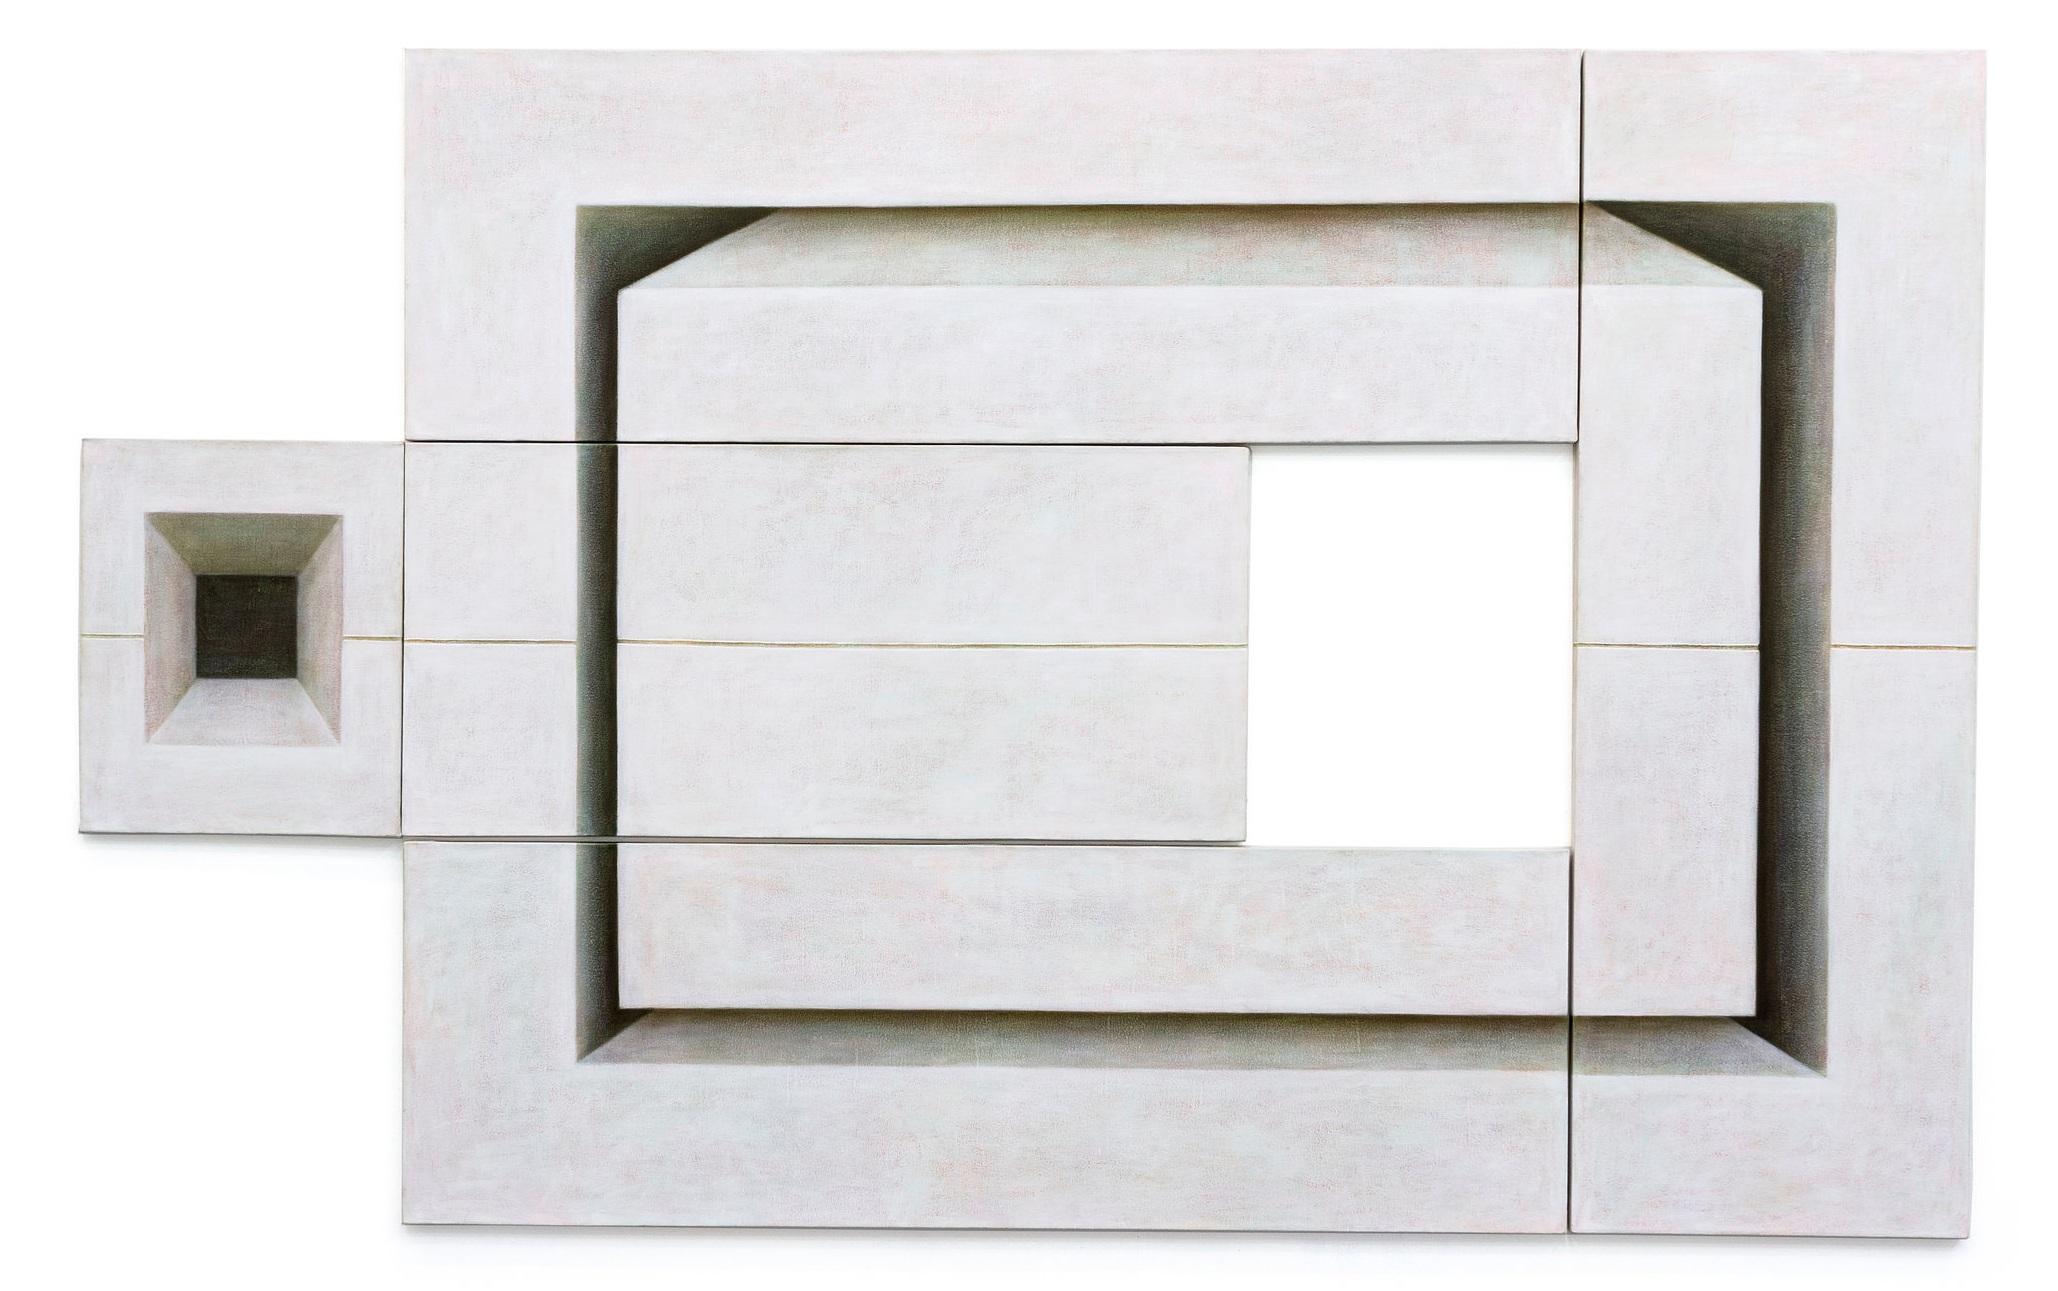 Adriana Maciel, Deslocamento - 5 partes, 2010-2011, acrílica sobre tela